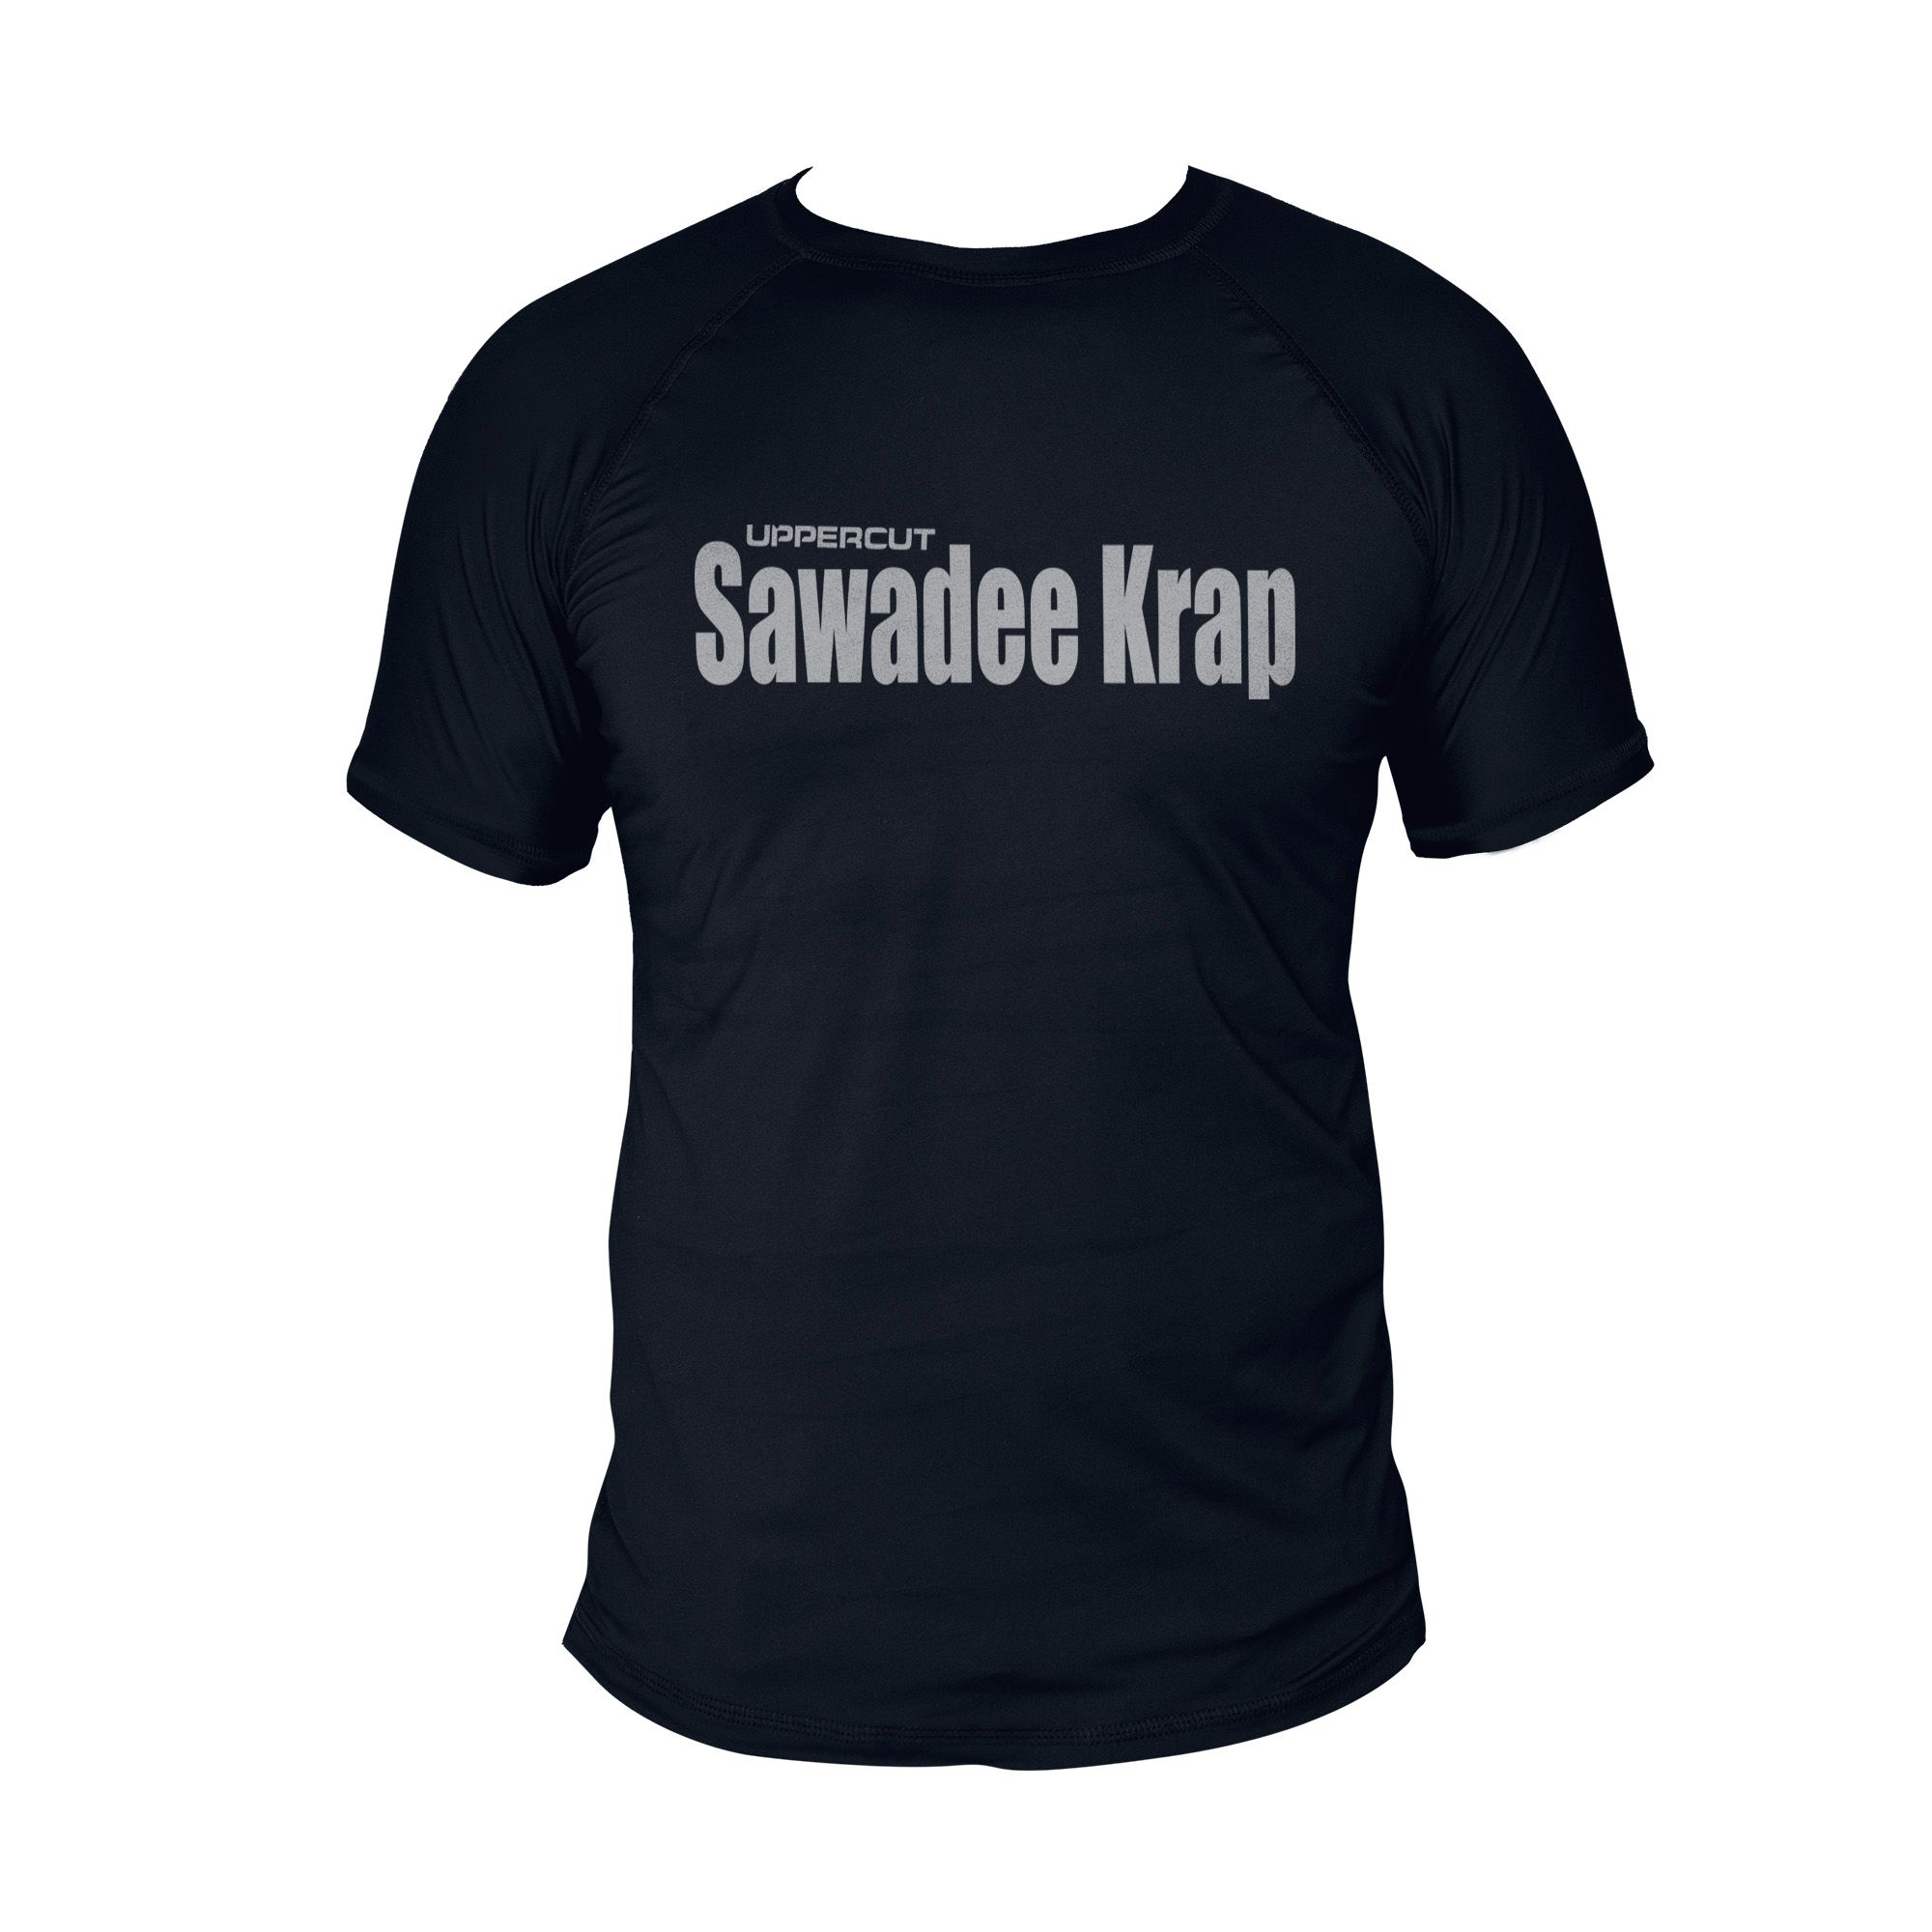 Camiseta Sawadee Krap Muay Thai U-xx - Dry Fit UV50+ Preta